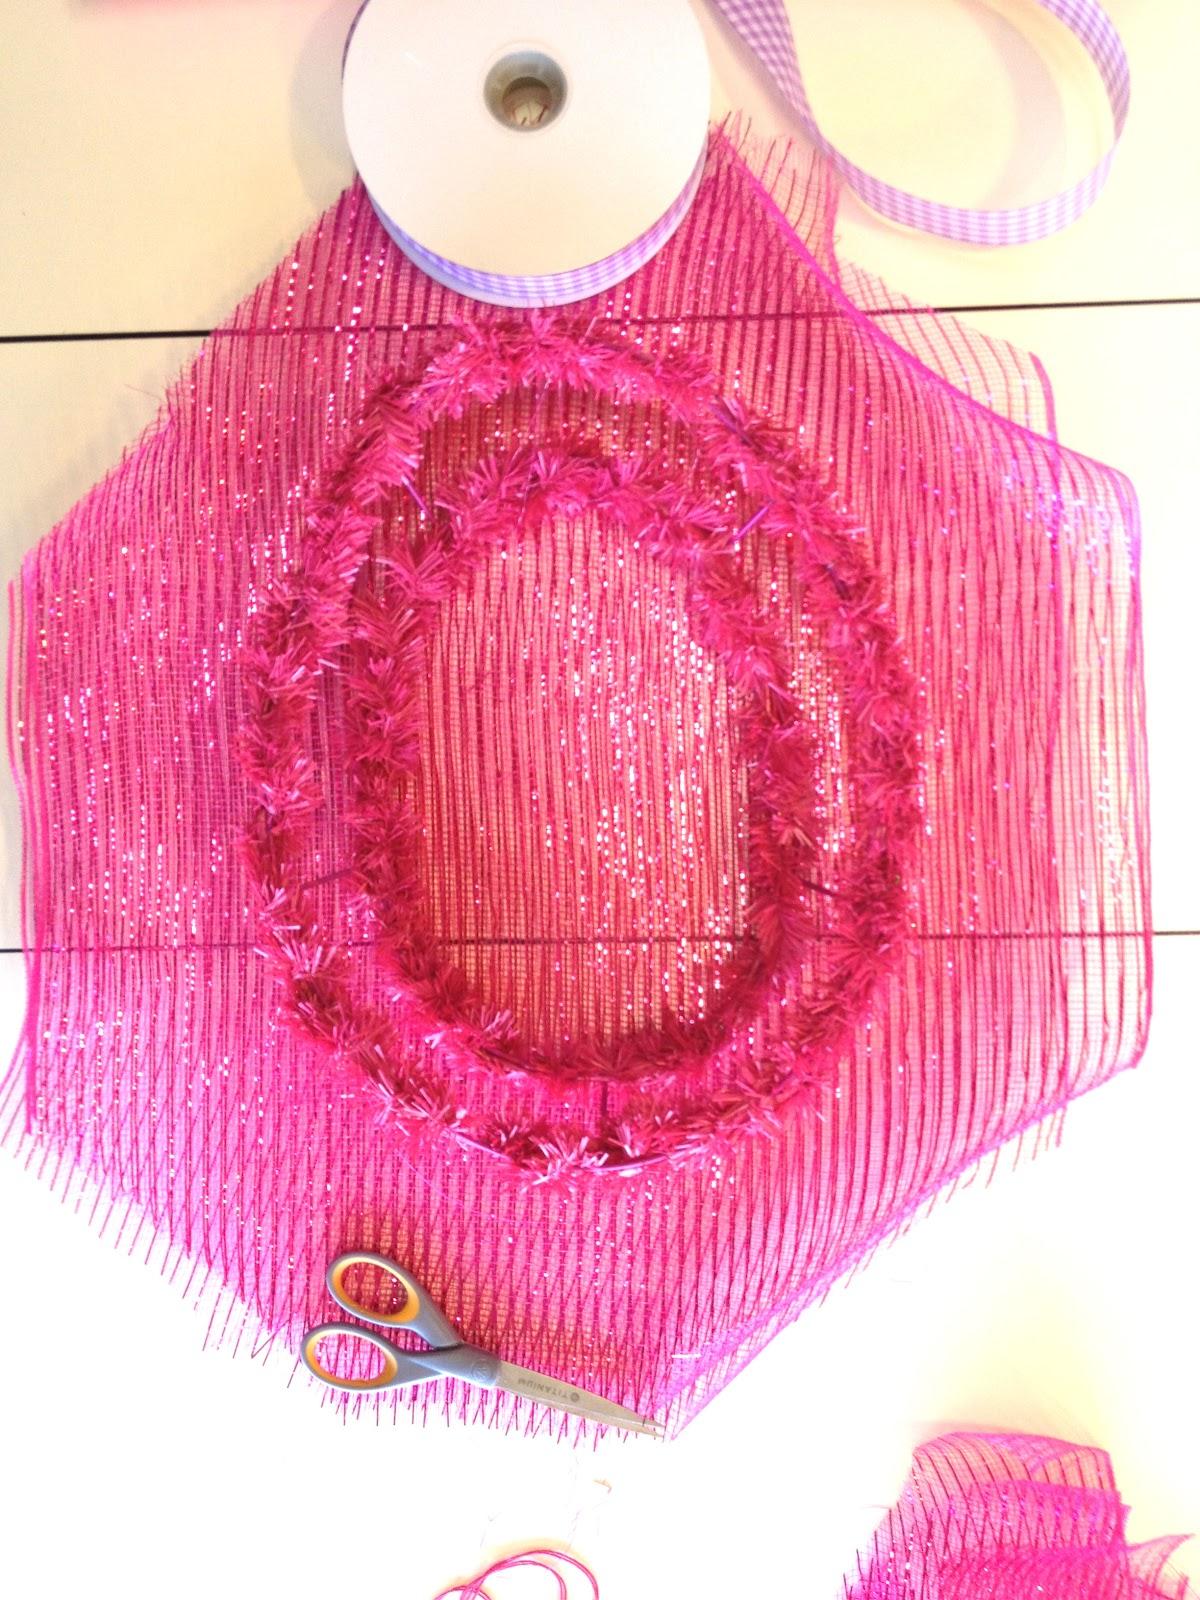 Deco mesh wreath form fall deco mesh wreaths how to make deco mesh